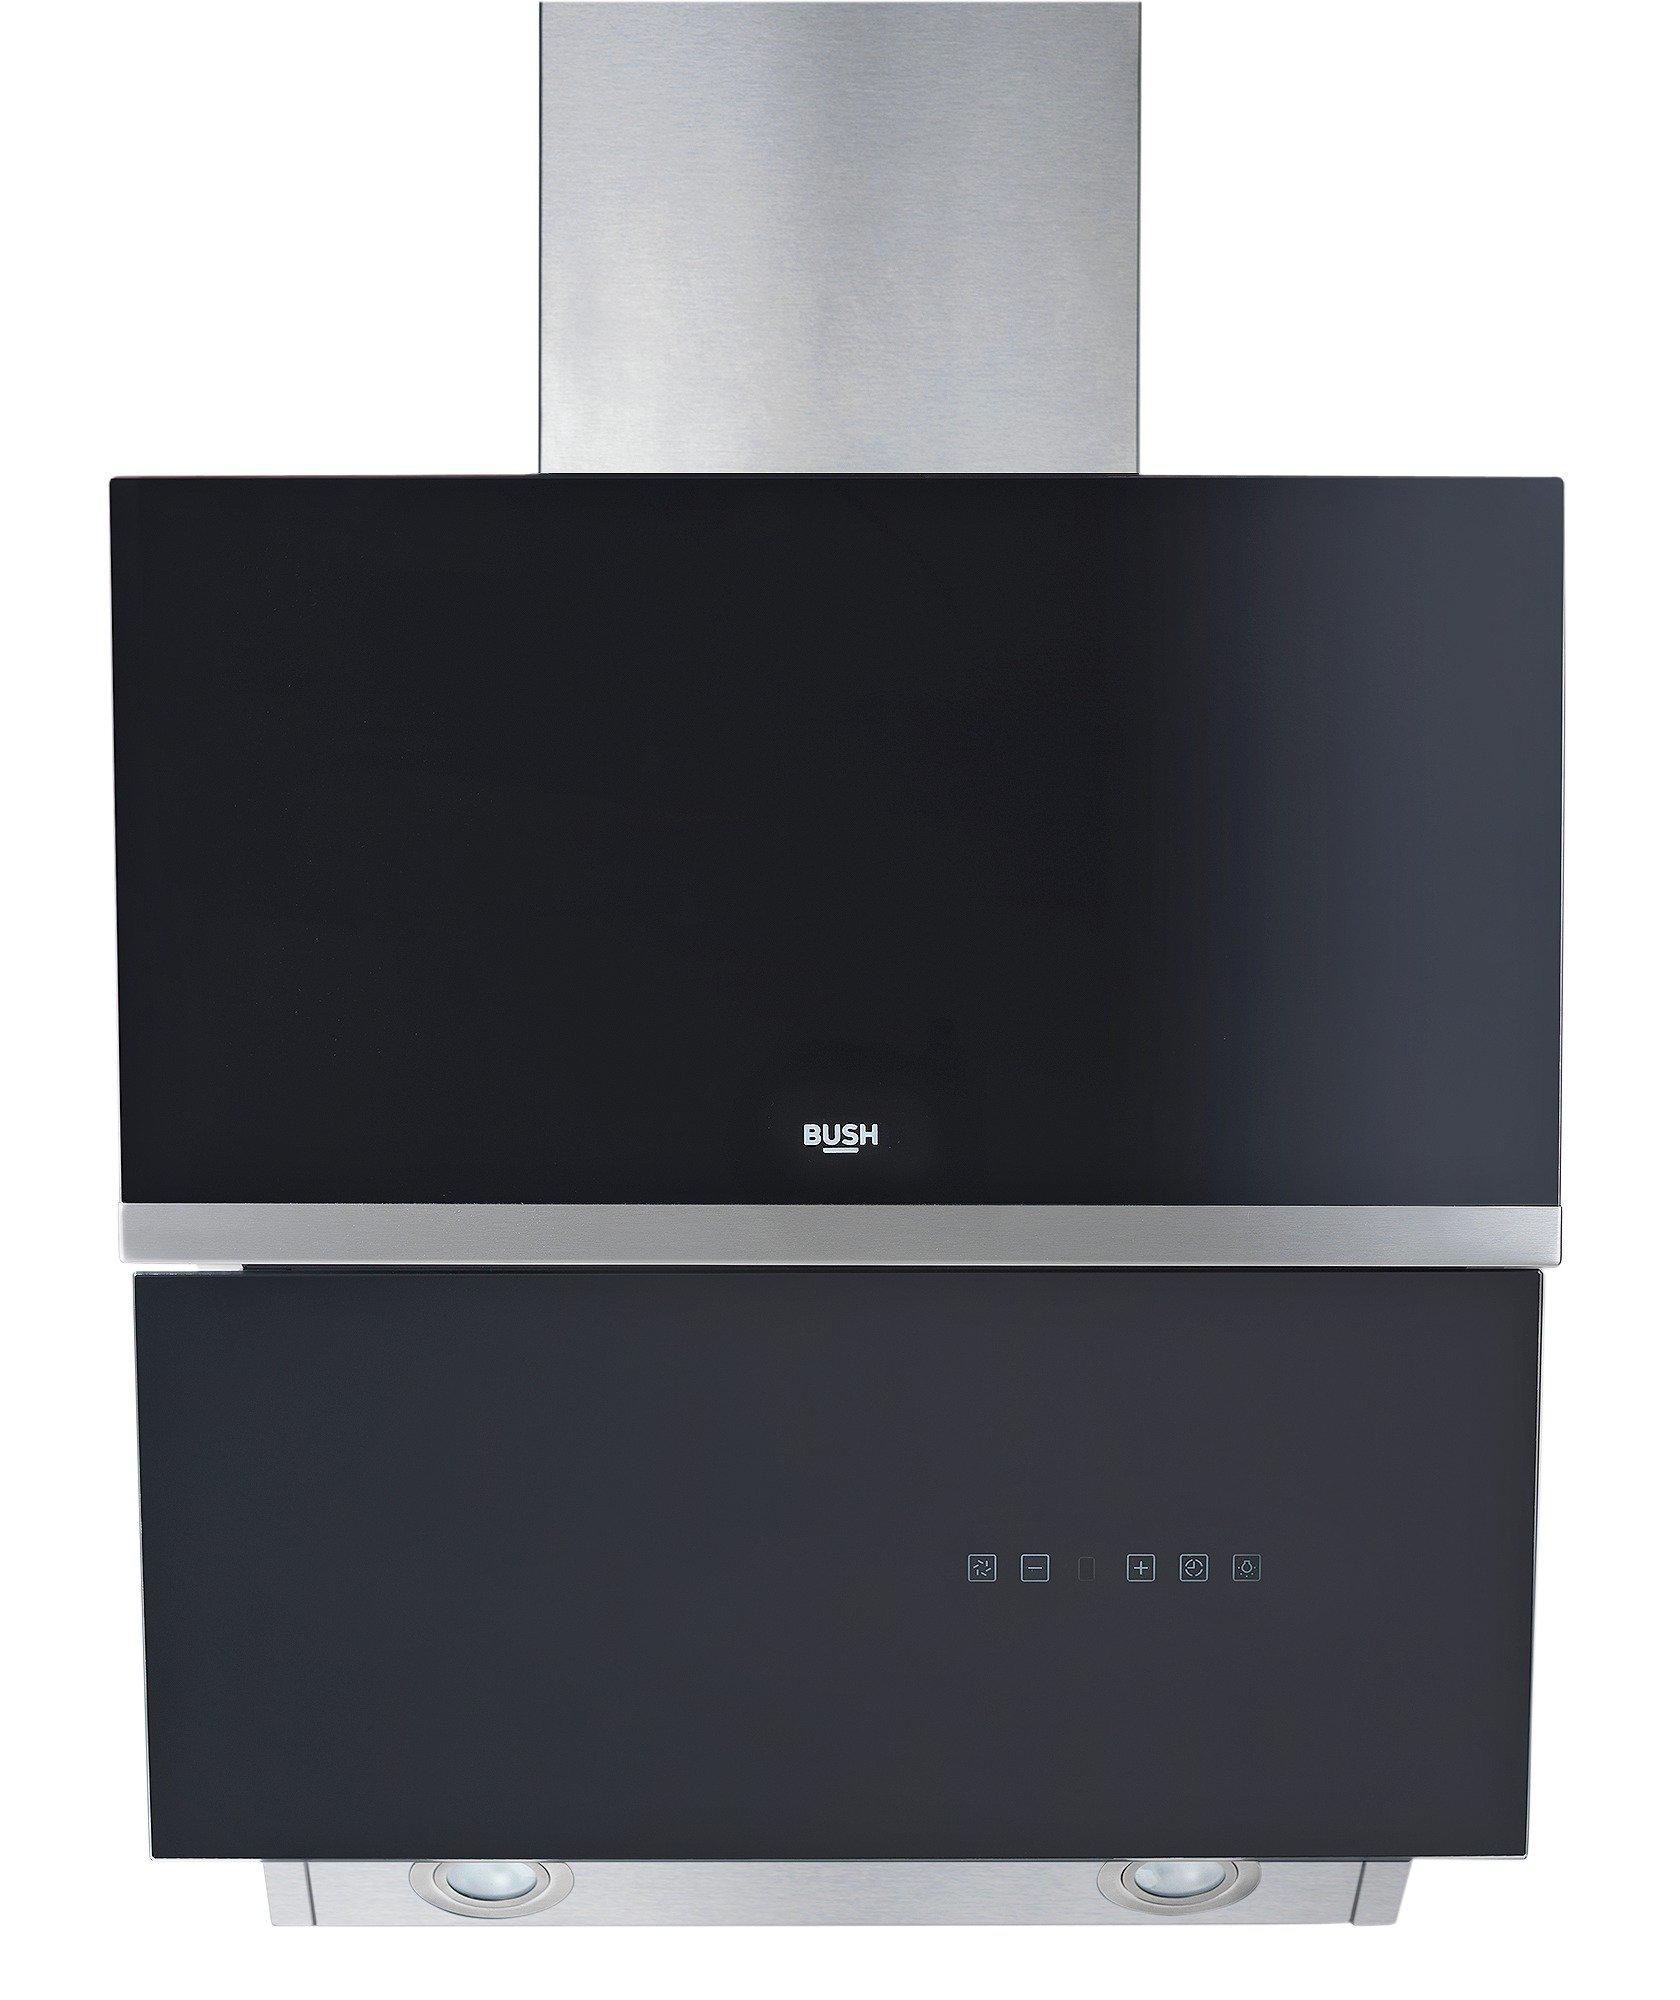 sofasandstuff reviews sofa online bestellen schweiz bush btch60x cooker hood stainless steel